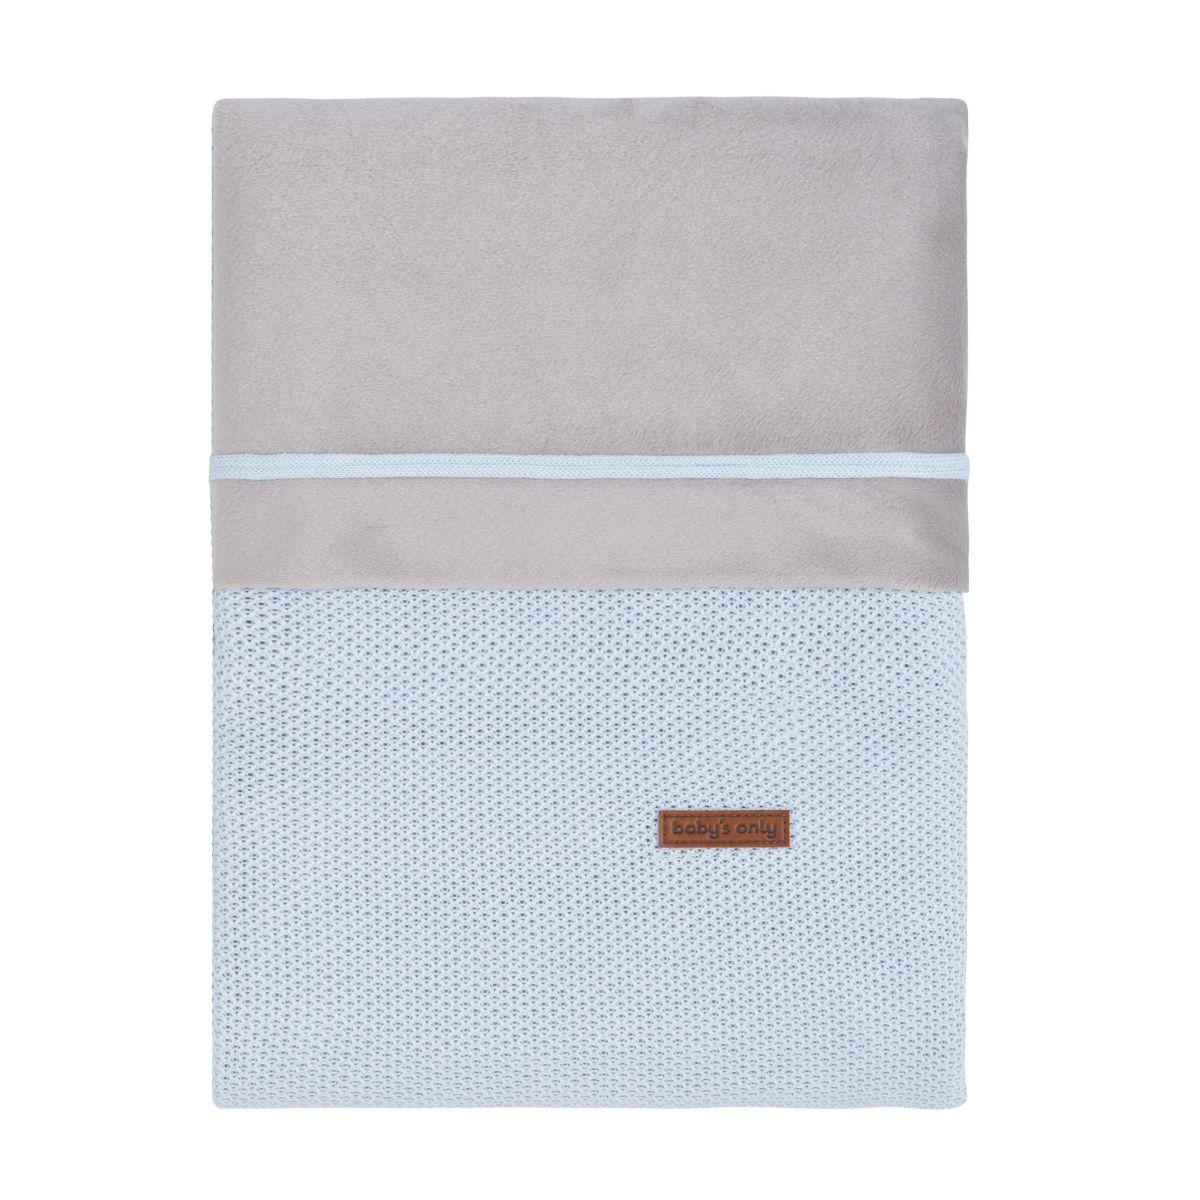 duvet cover classic powder blue 100x135